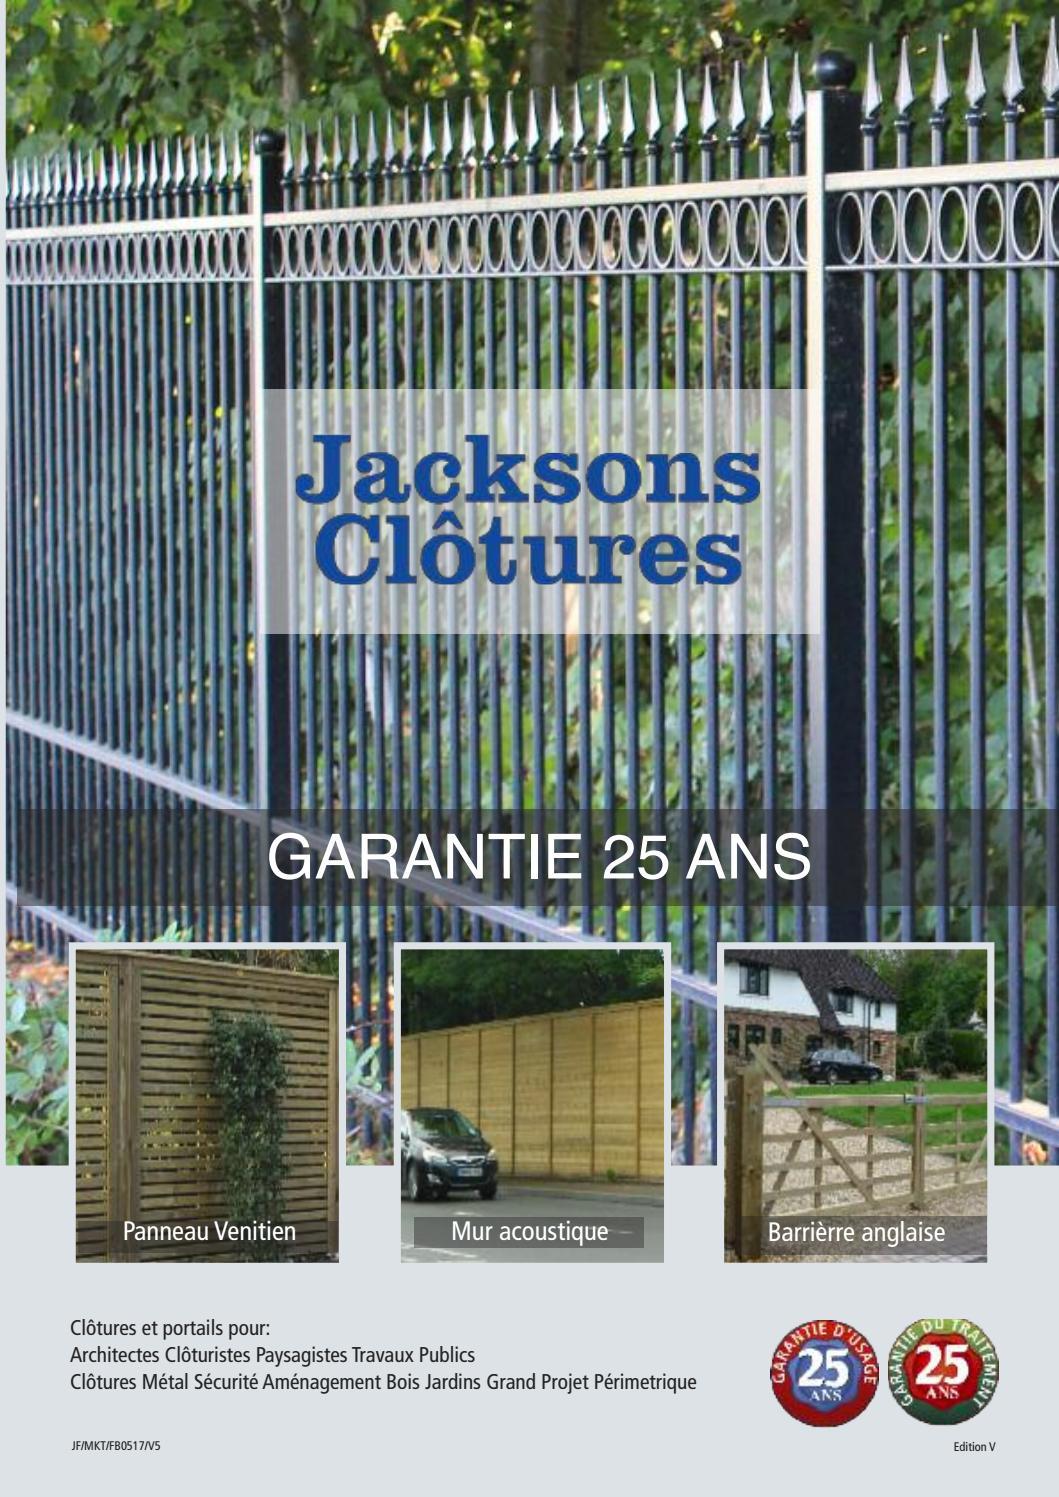 Cloture Bois Hauteur 2M50 jacksons clotures 2017jacksons fencing - issuu